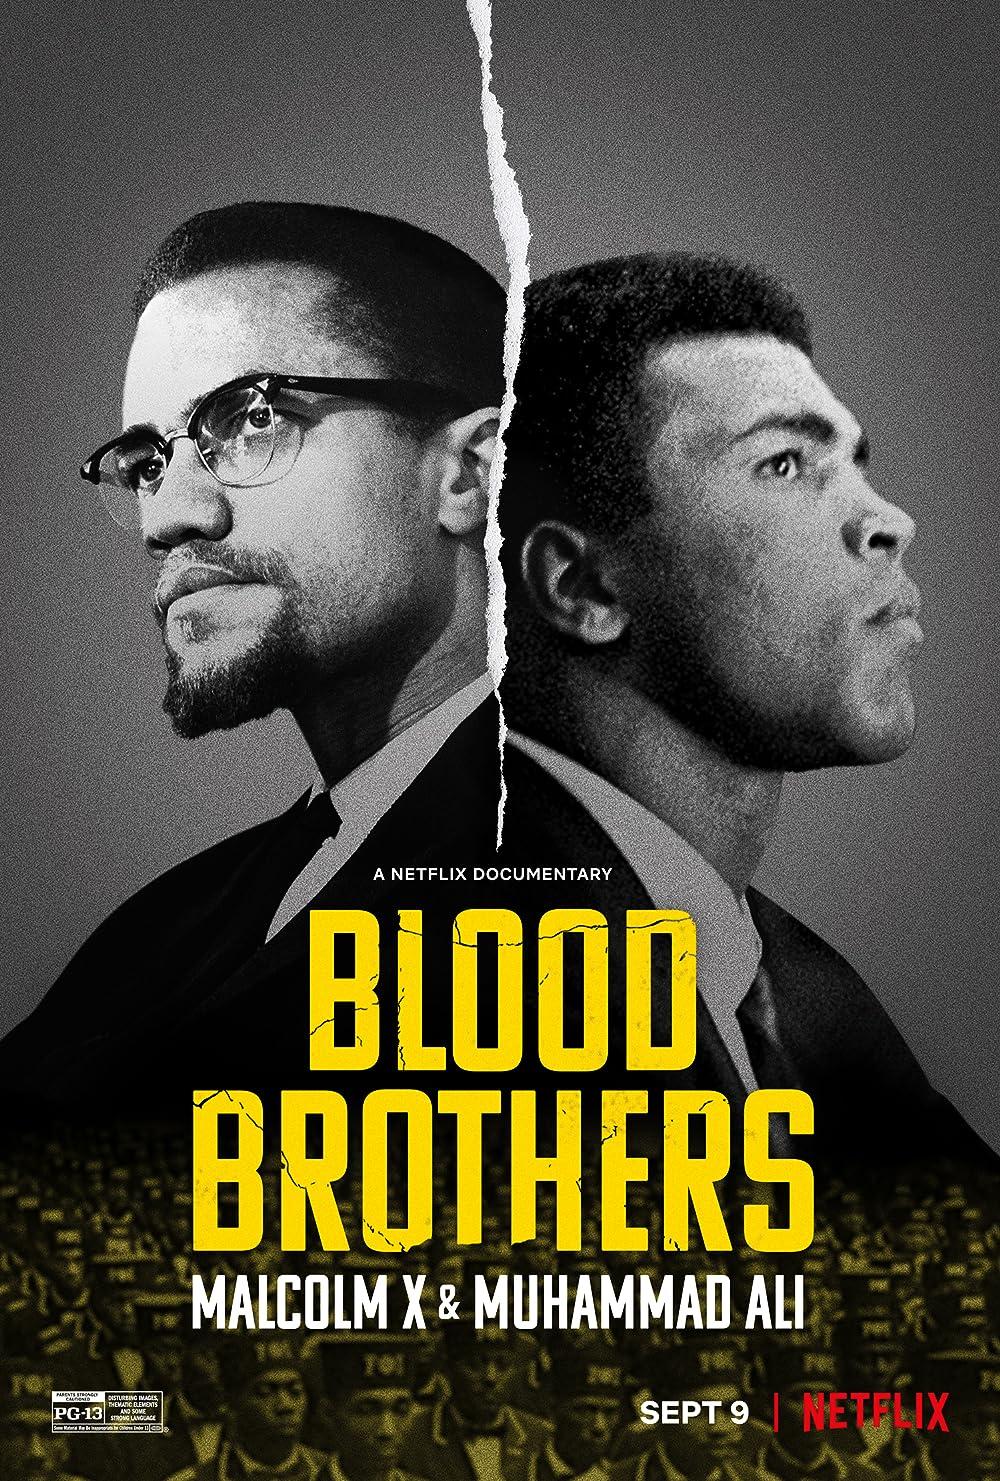 Kan Kardeşler Malcolm X ve Muhammed Ali - Blood Brothers Malcolm X & Muhammad Ali (2021) 1080p NF WEB-DL DDP5.1 Atmos H.264 DUAL [TR EN]